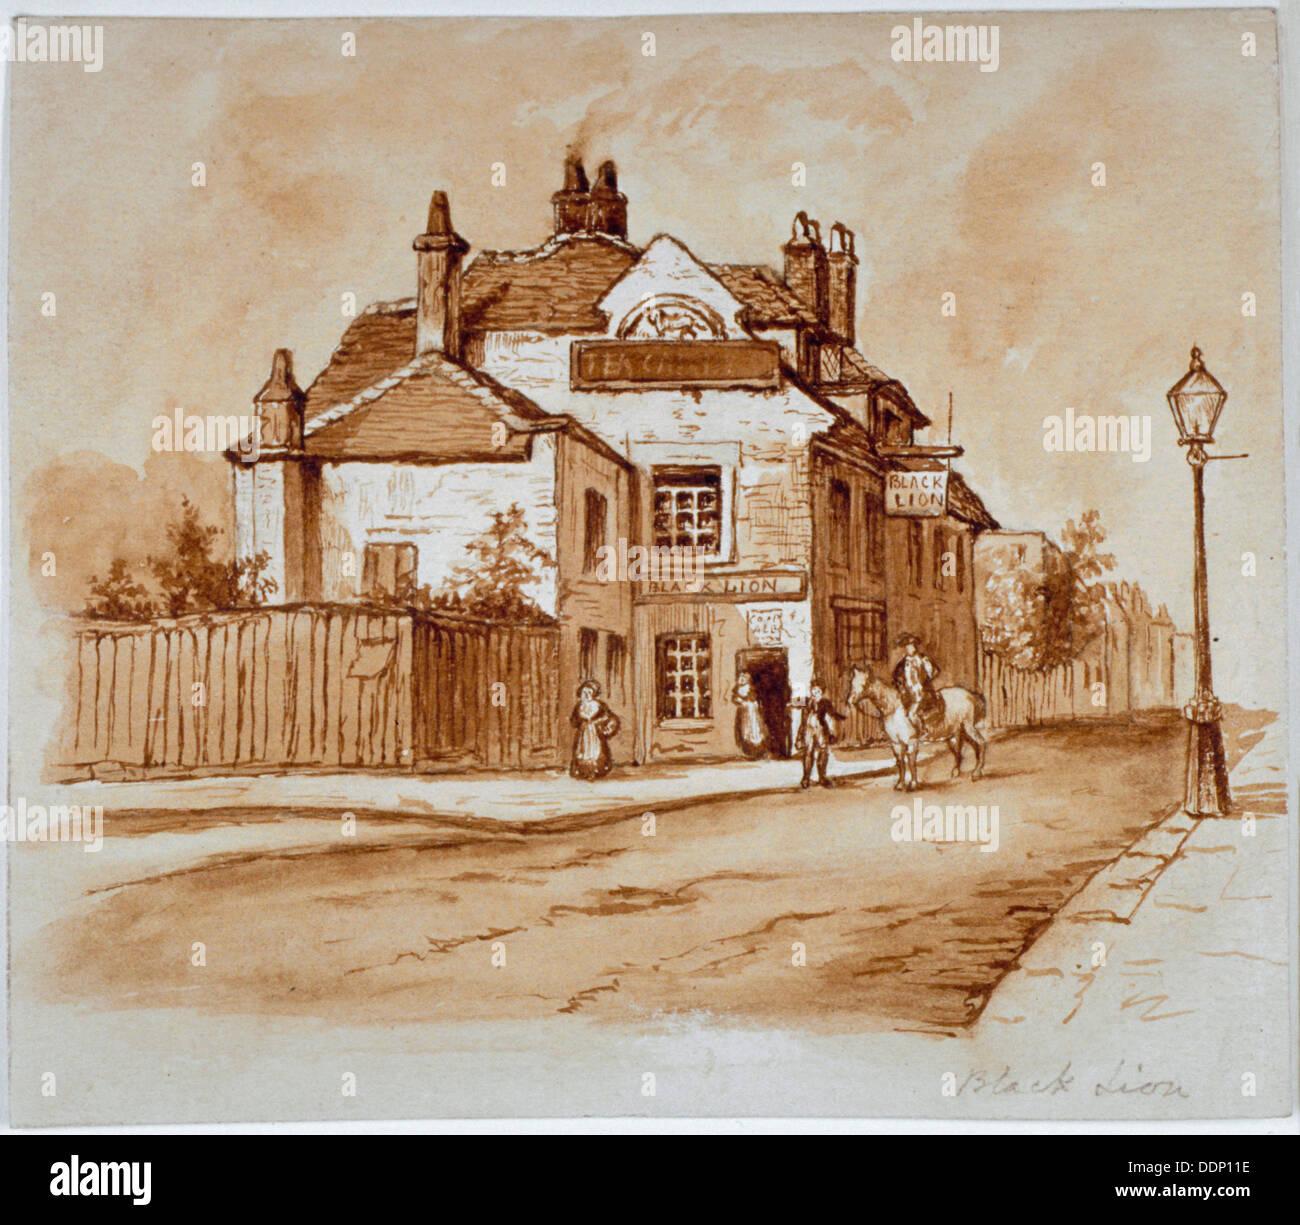 View of the Black Lion Inn, Church Street, Chelsea, London, 1860.                                    Artist: Anon - Stock Image